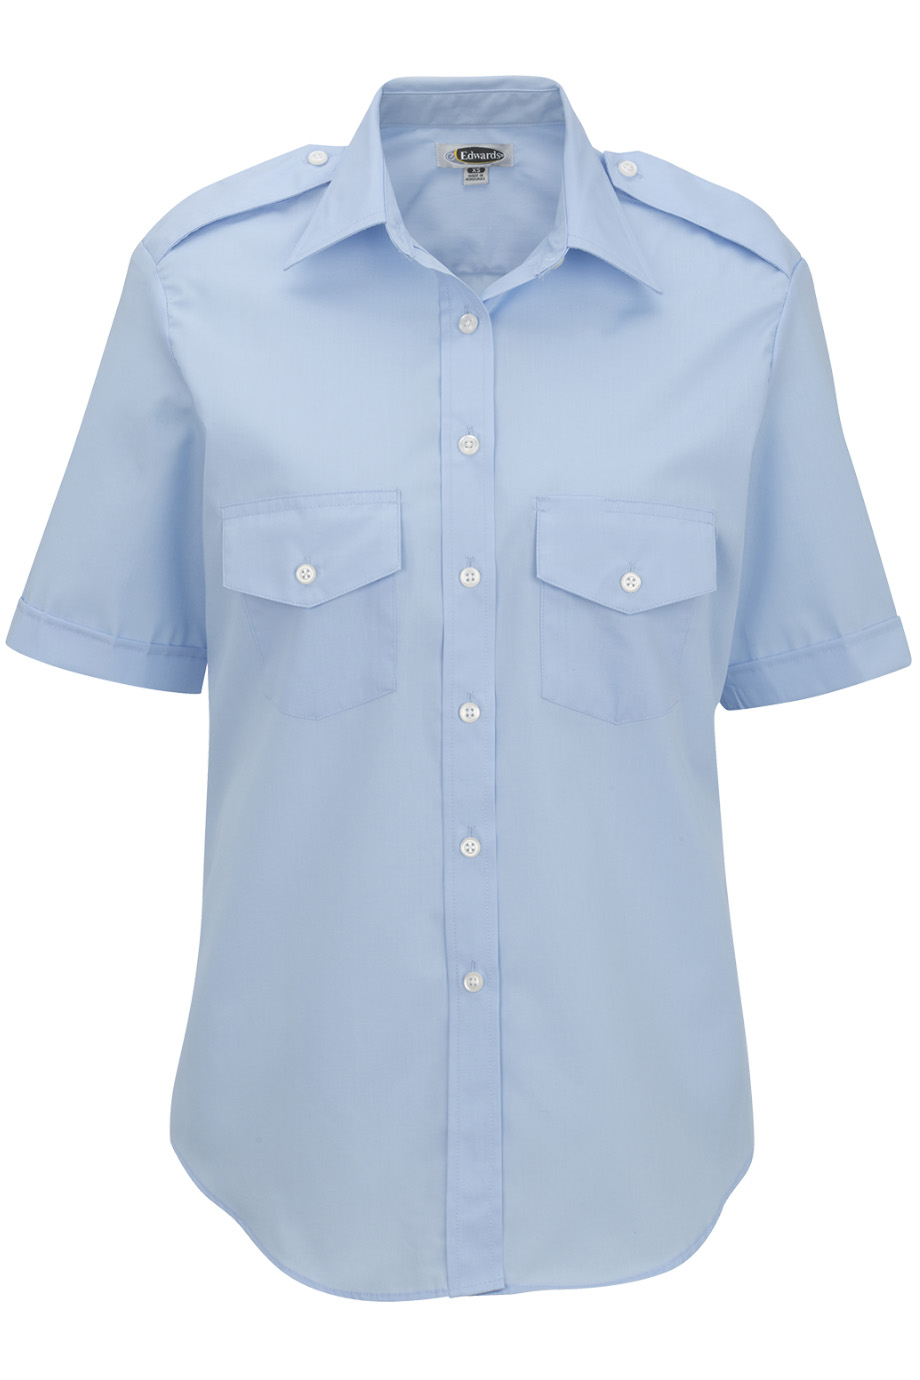 Ladies' Short Sleeve Navigator Shirt 5212